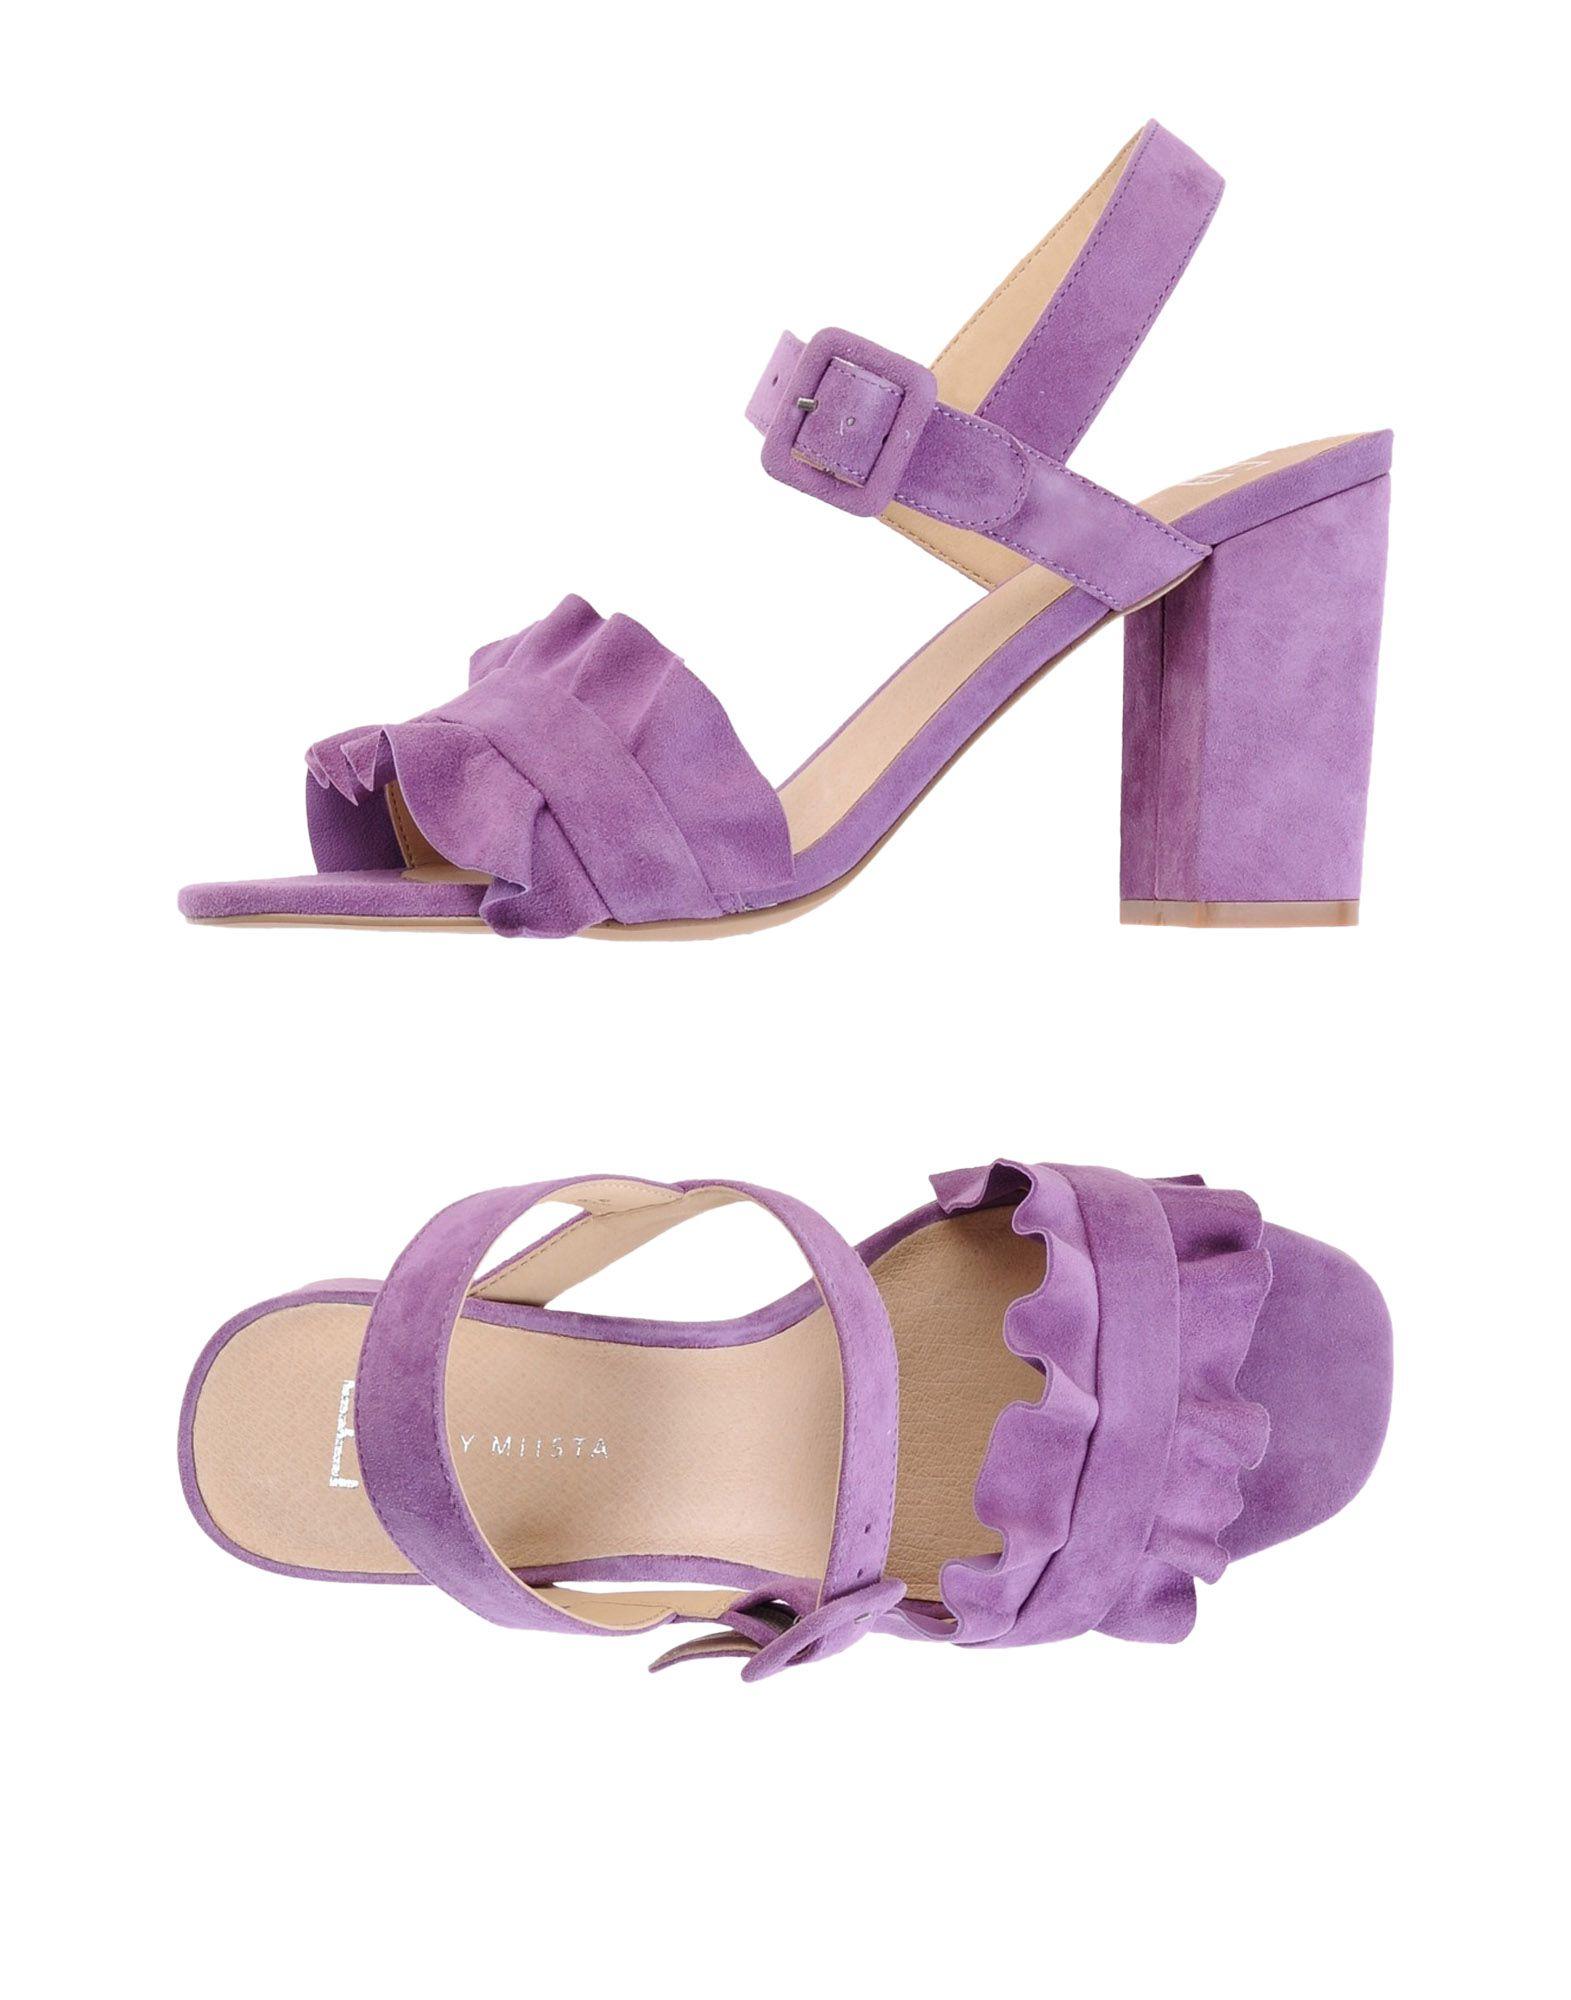 E8 By - Miista Sadie - Sandals - By Women E8 By Miista Sandals online on  Australia - 11468924PT 0b3f5b